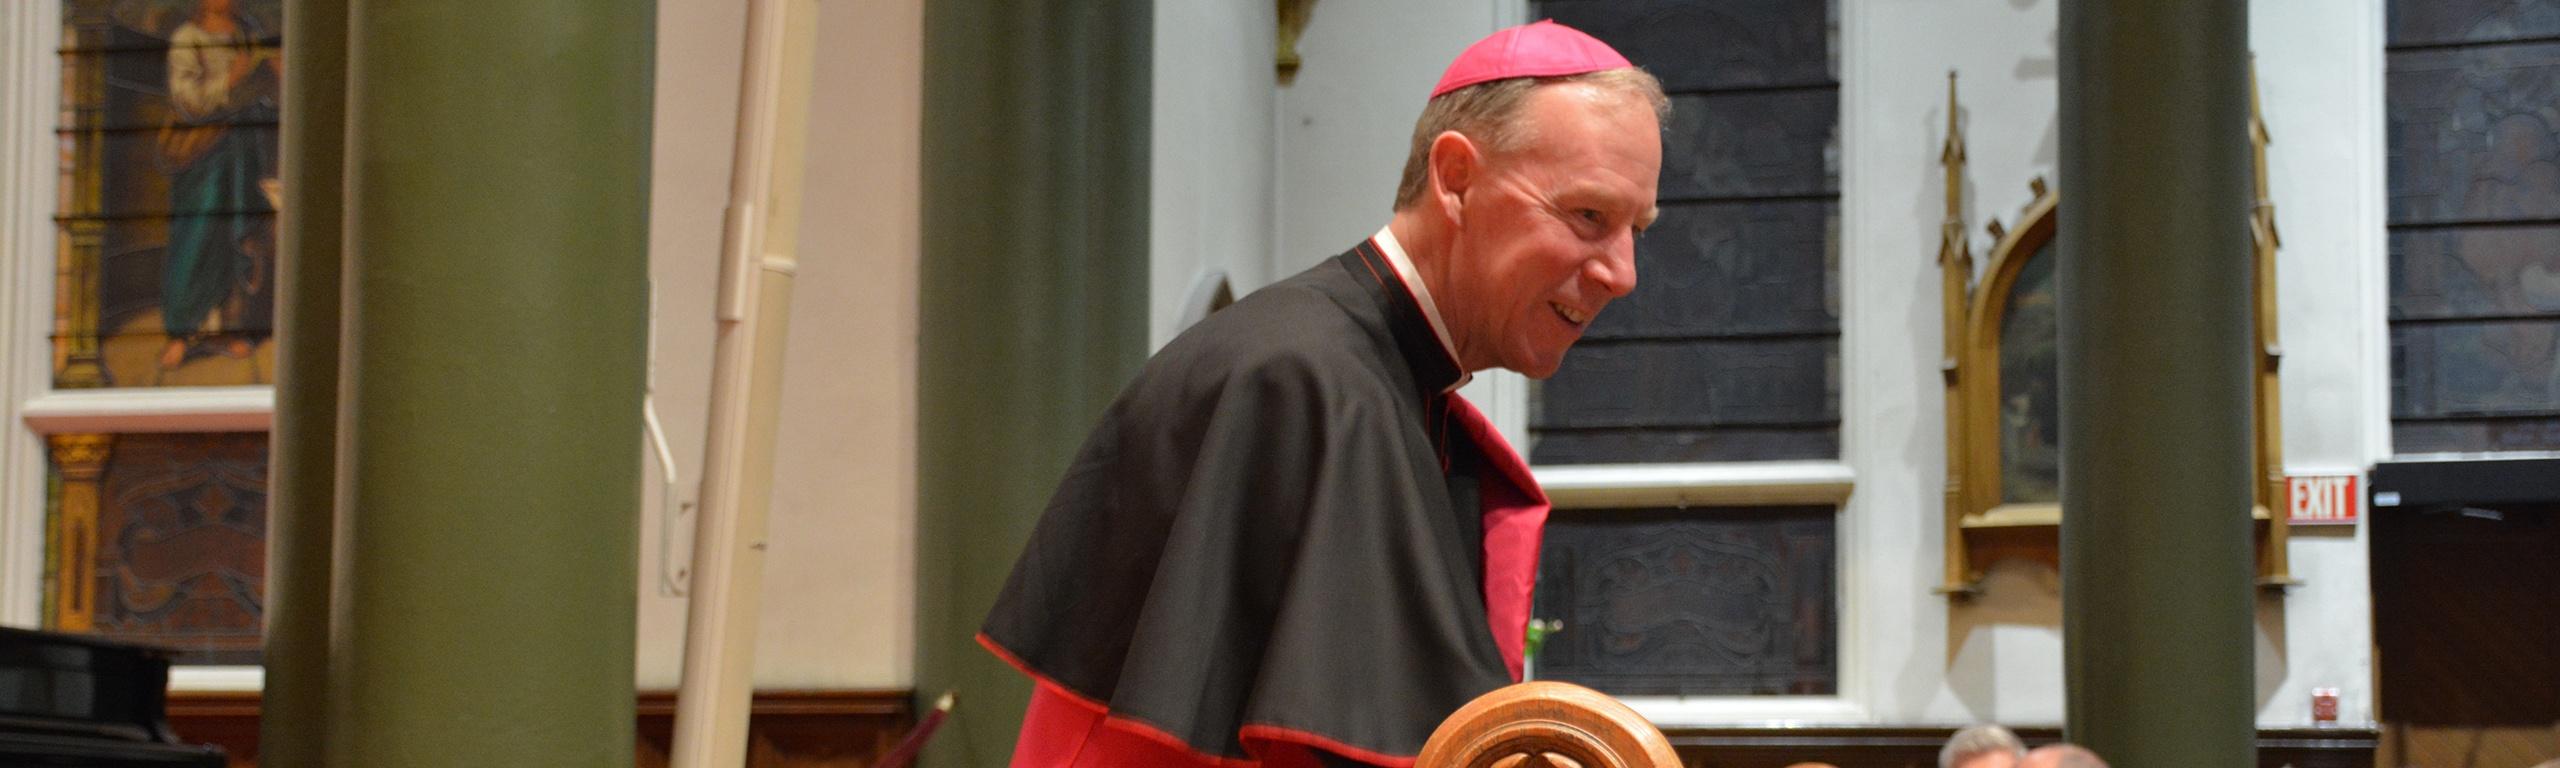 bishop-gary-greeting-parishioner